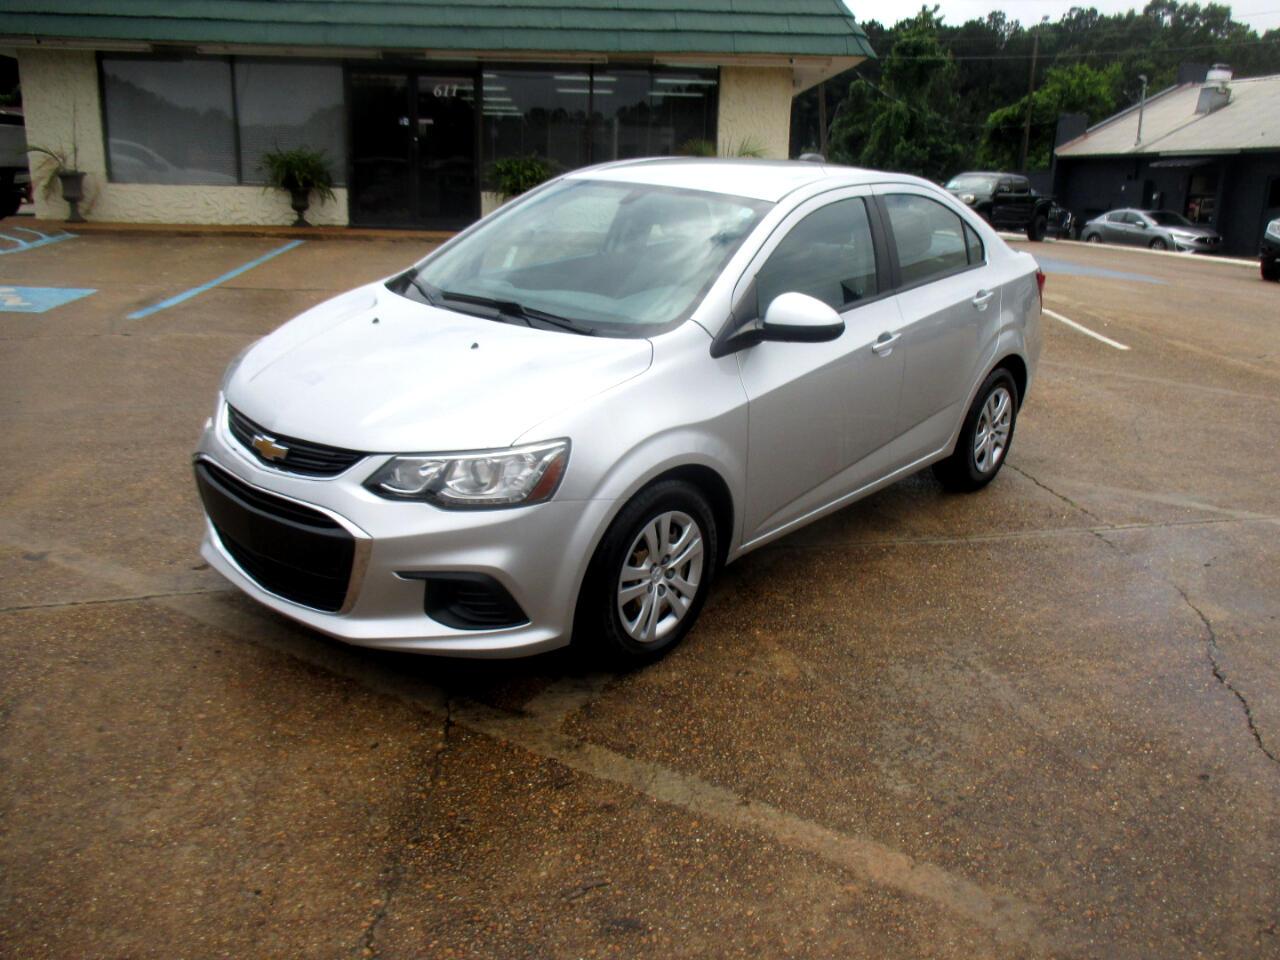 Chevrolet Sonic 4dr Sdn Auto LS 2017